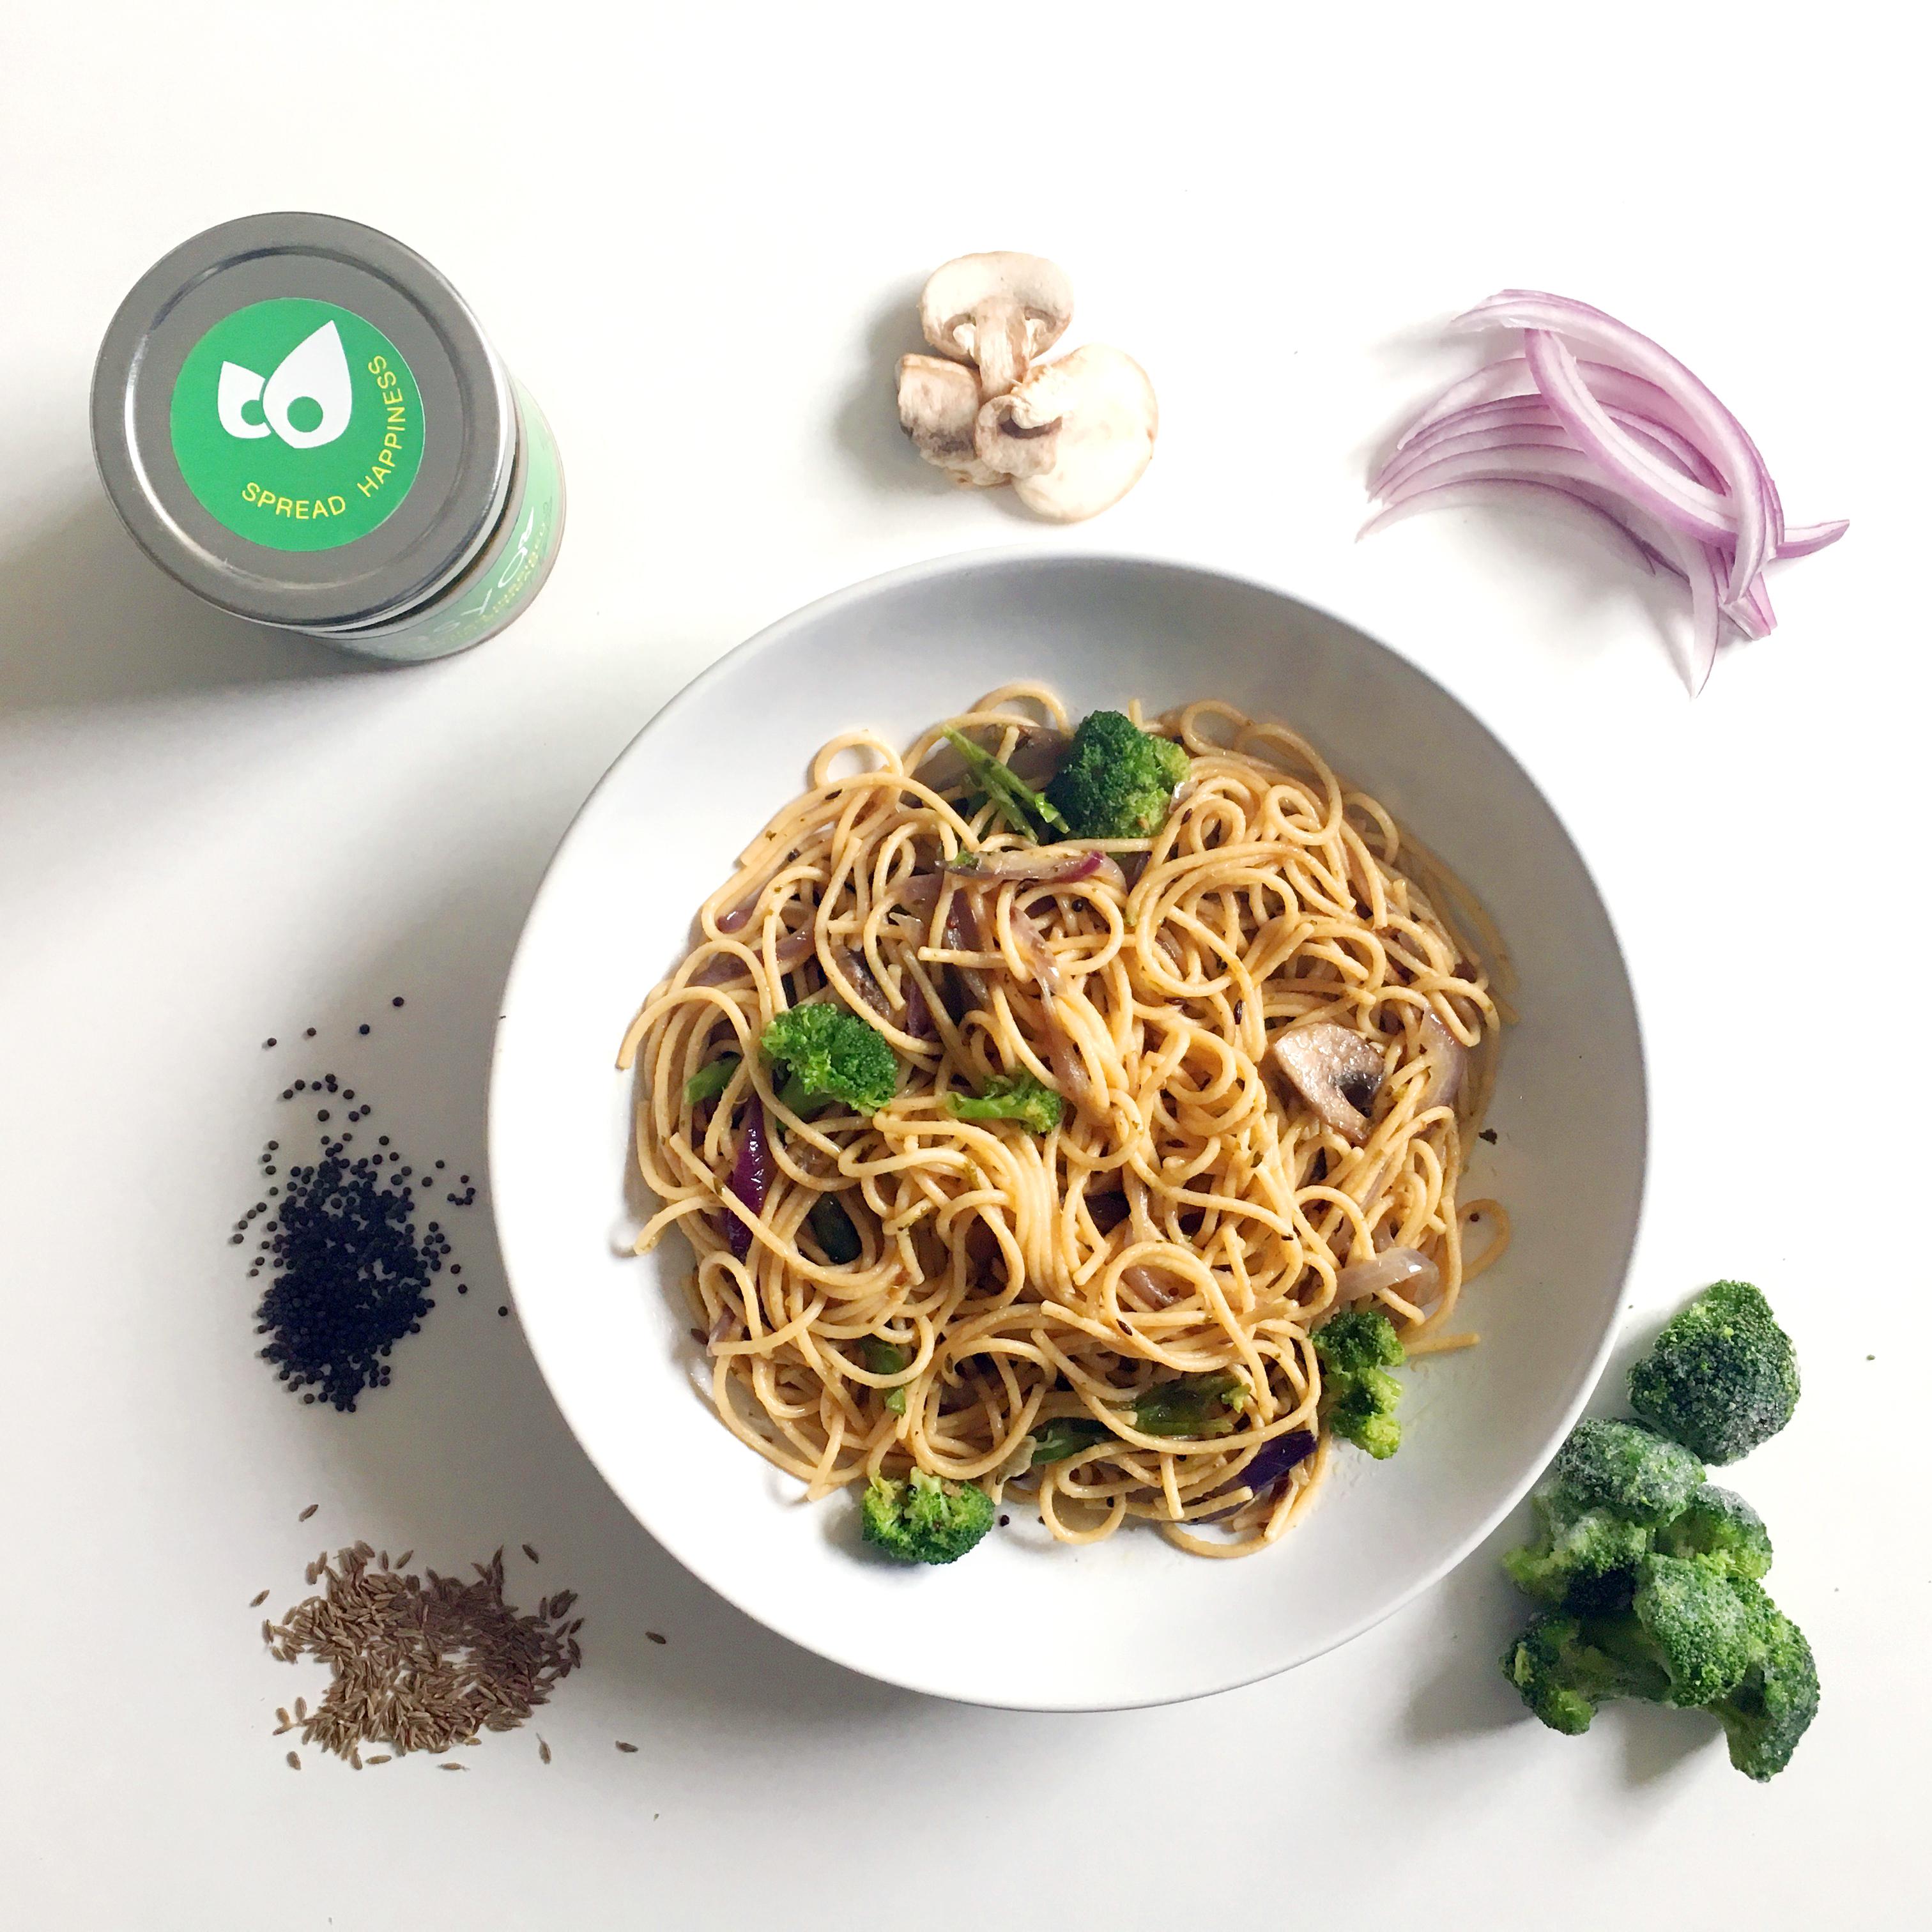 Picture of Pasta-Cilantro-Broccoli-Mushroom-Sasya with ingredients